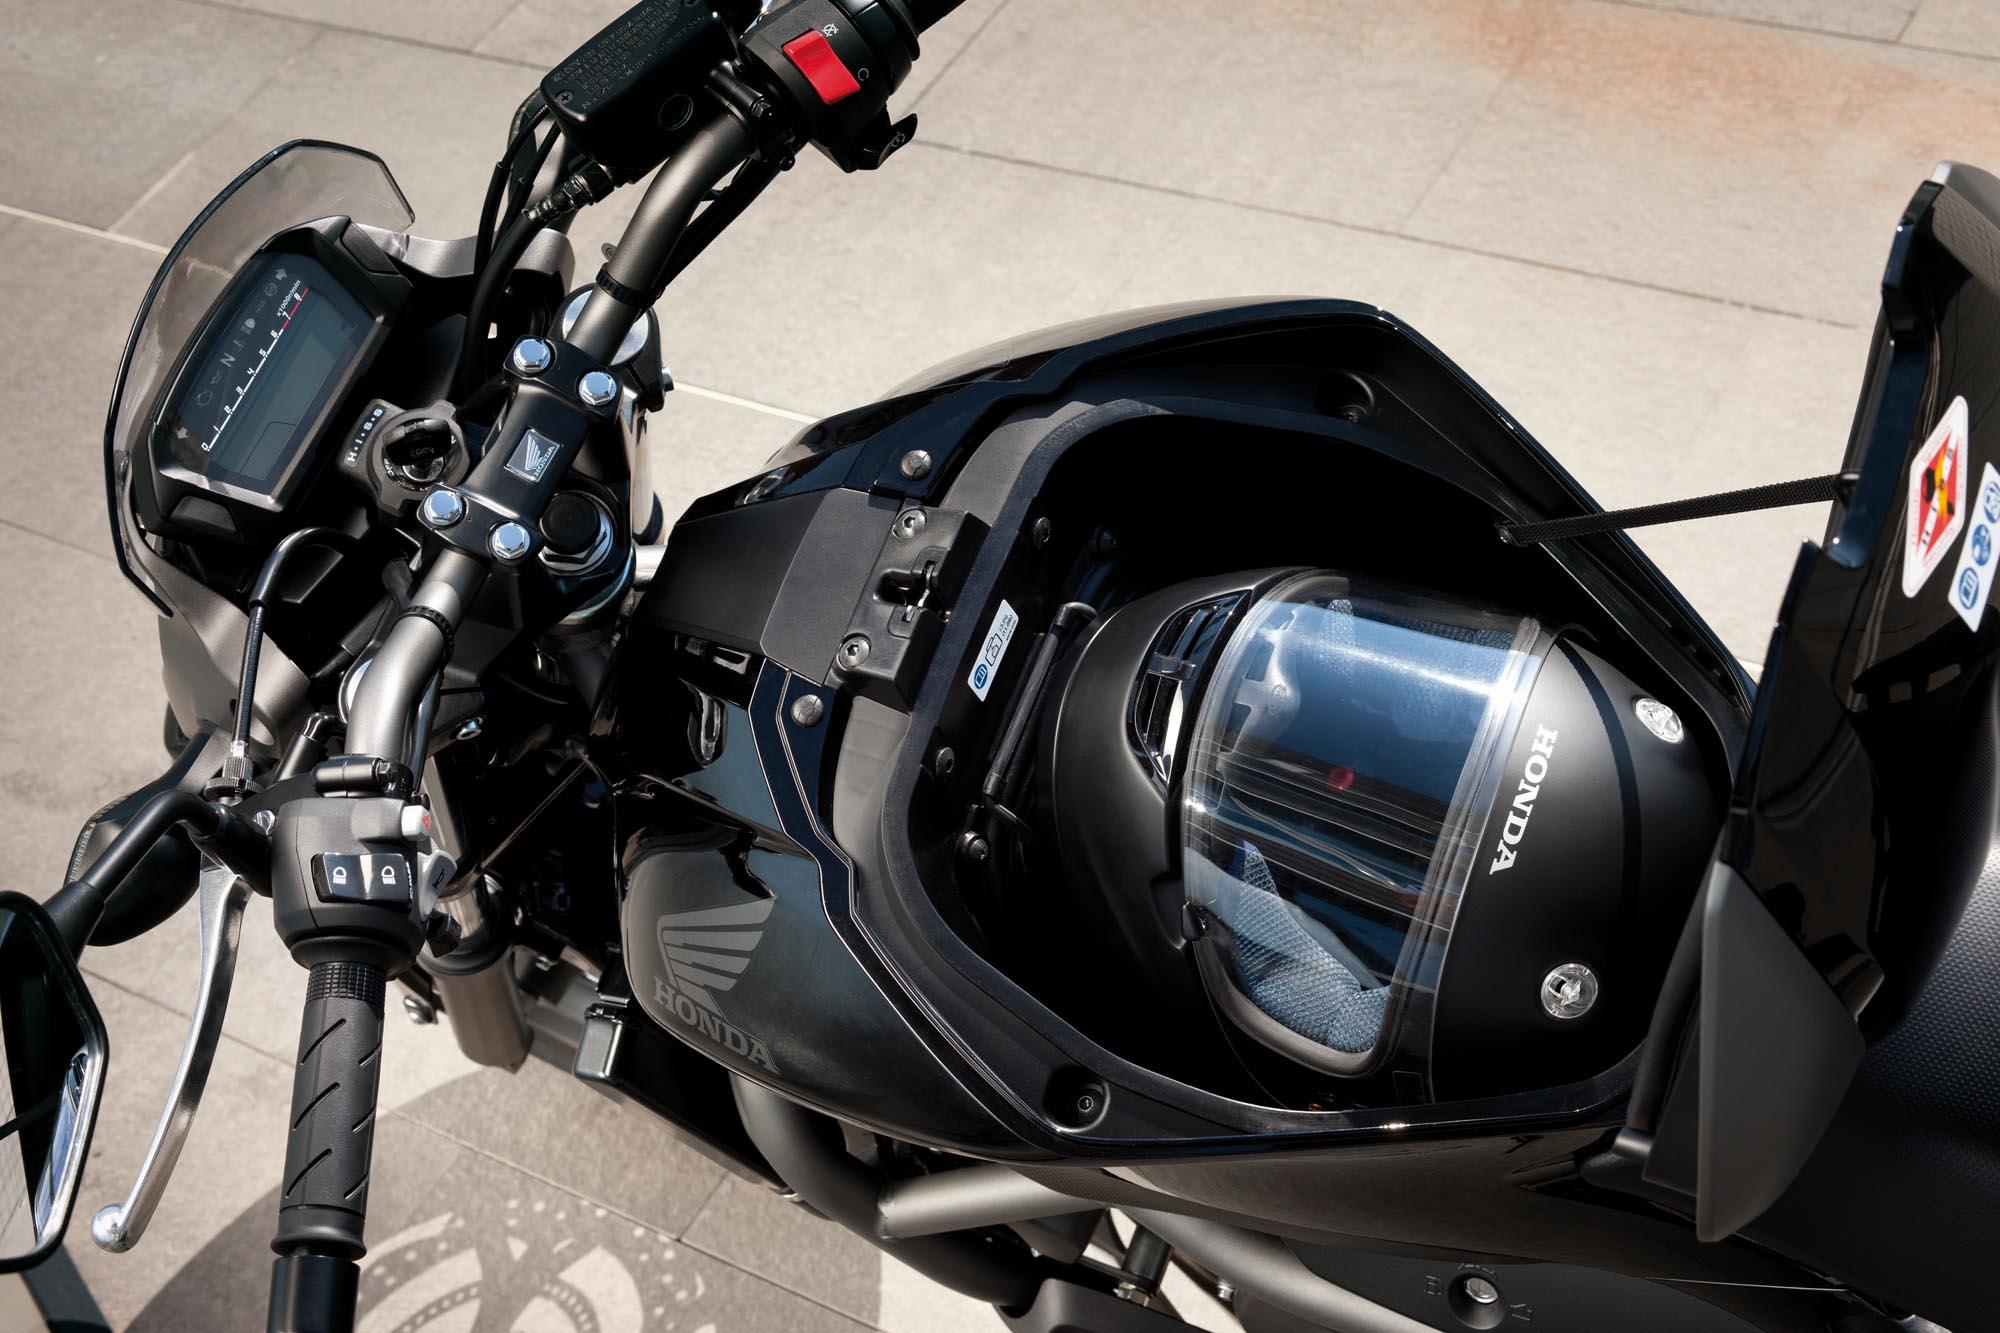 2012 Honda NC700S - The Return of the Standard - Asphalt & Rubber